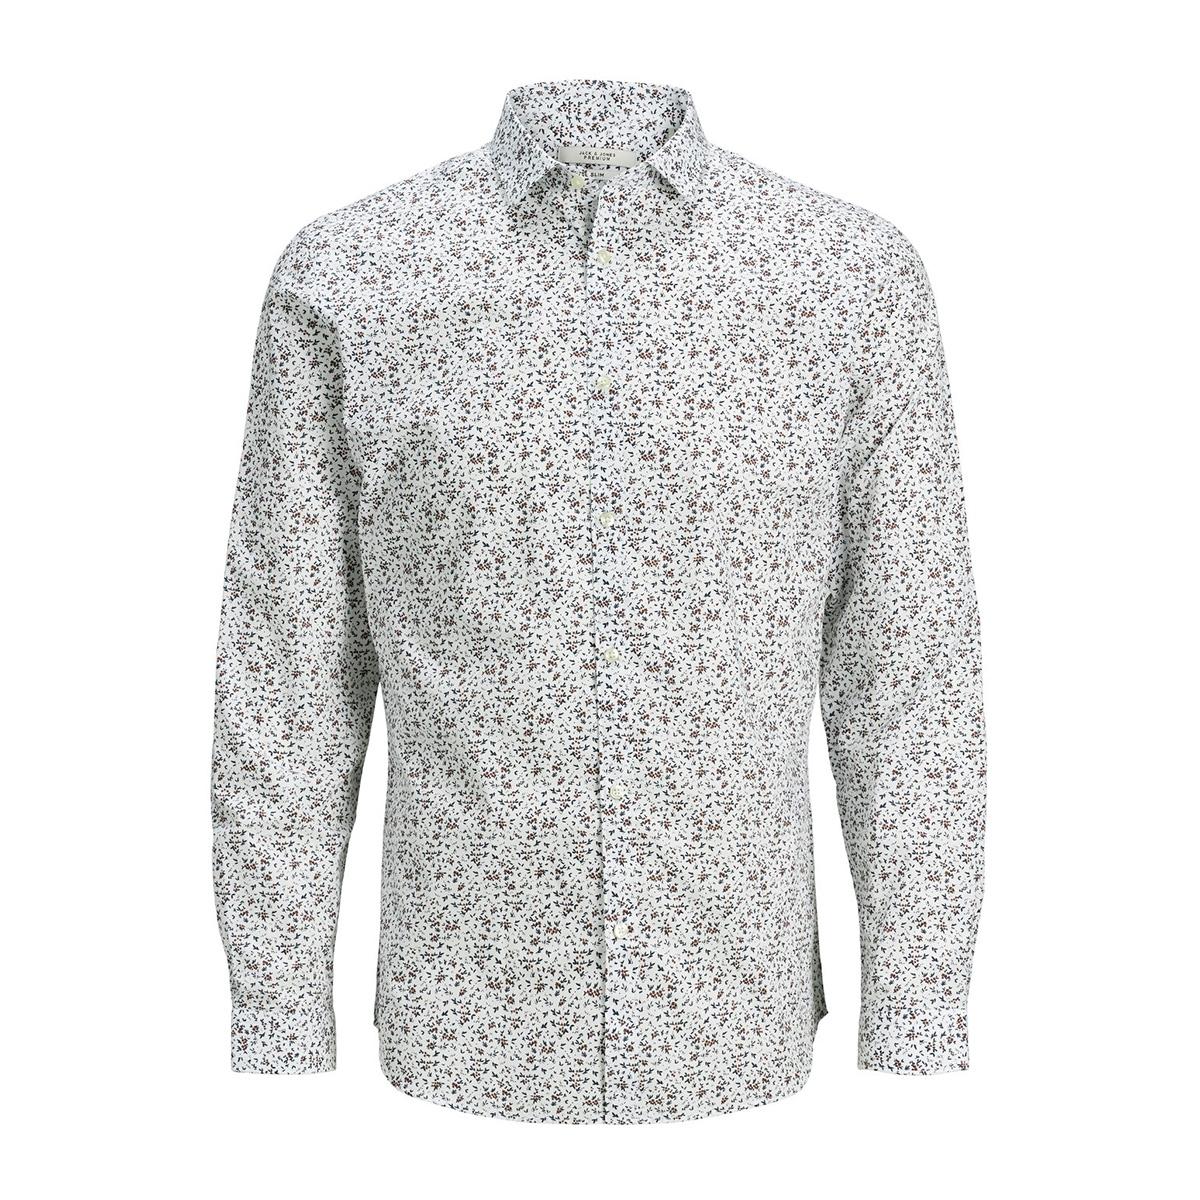 jprblablackpool shirt l/s s20 sts 12168452 jack & jones overhemd umber/slim fit